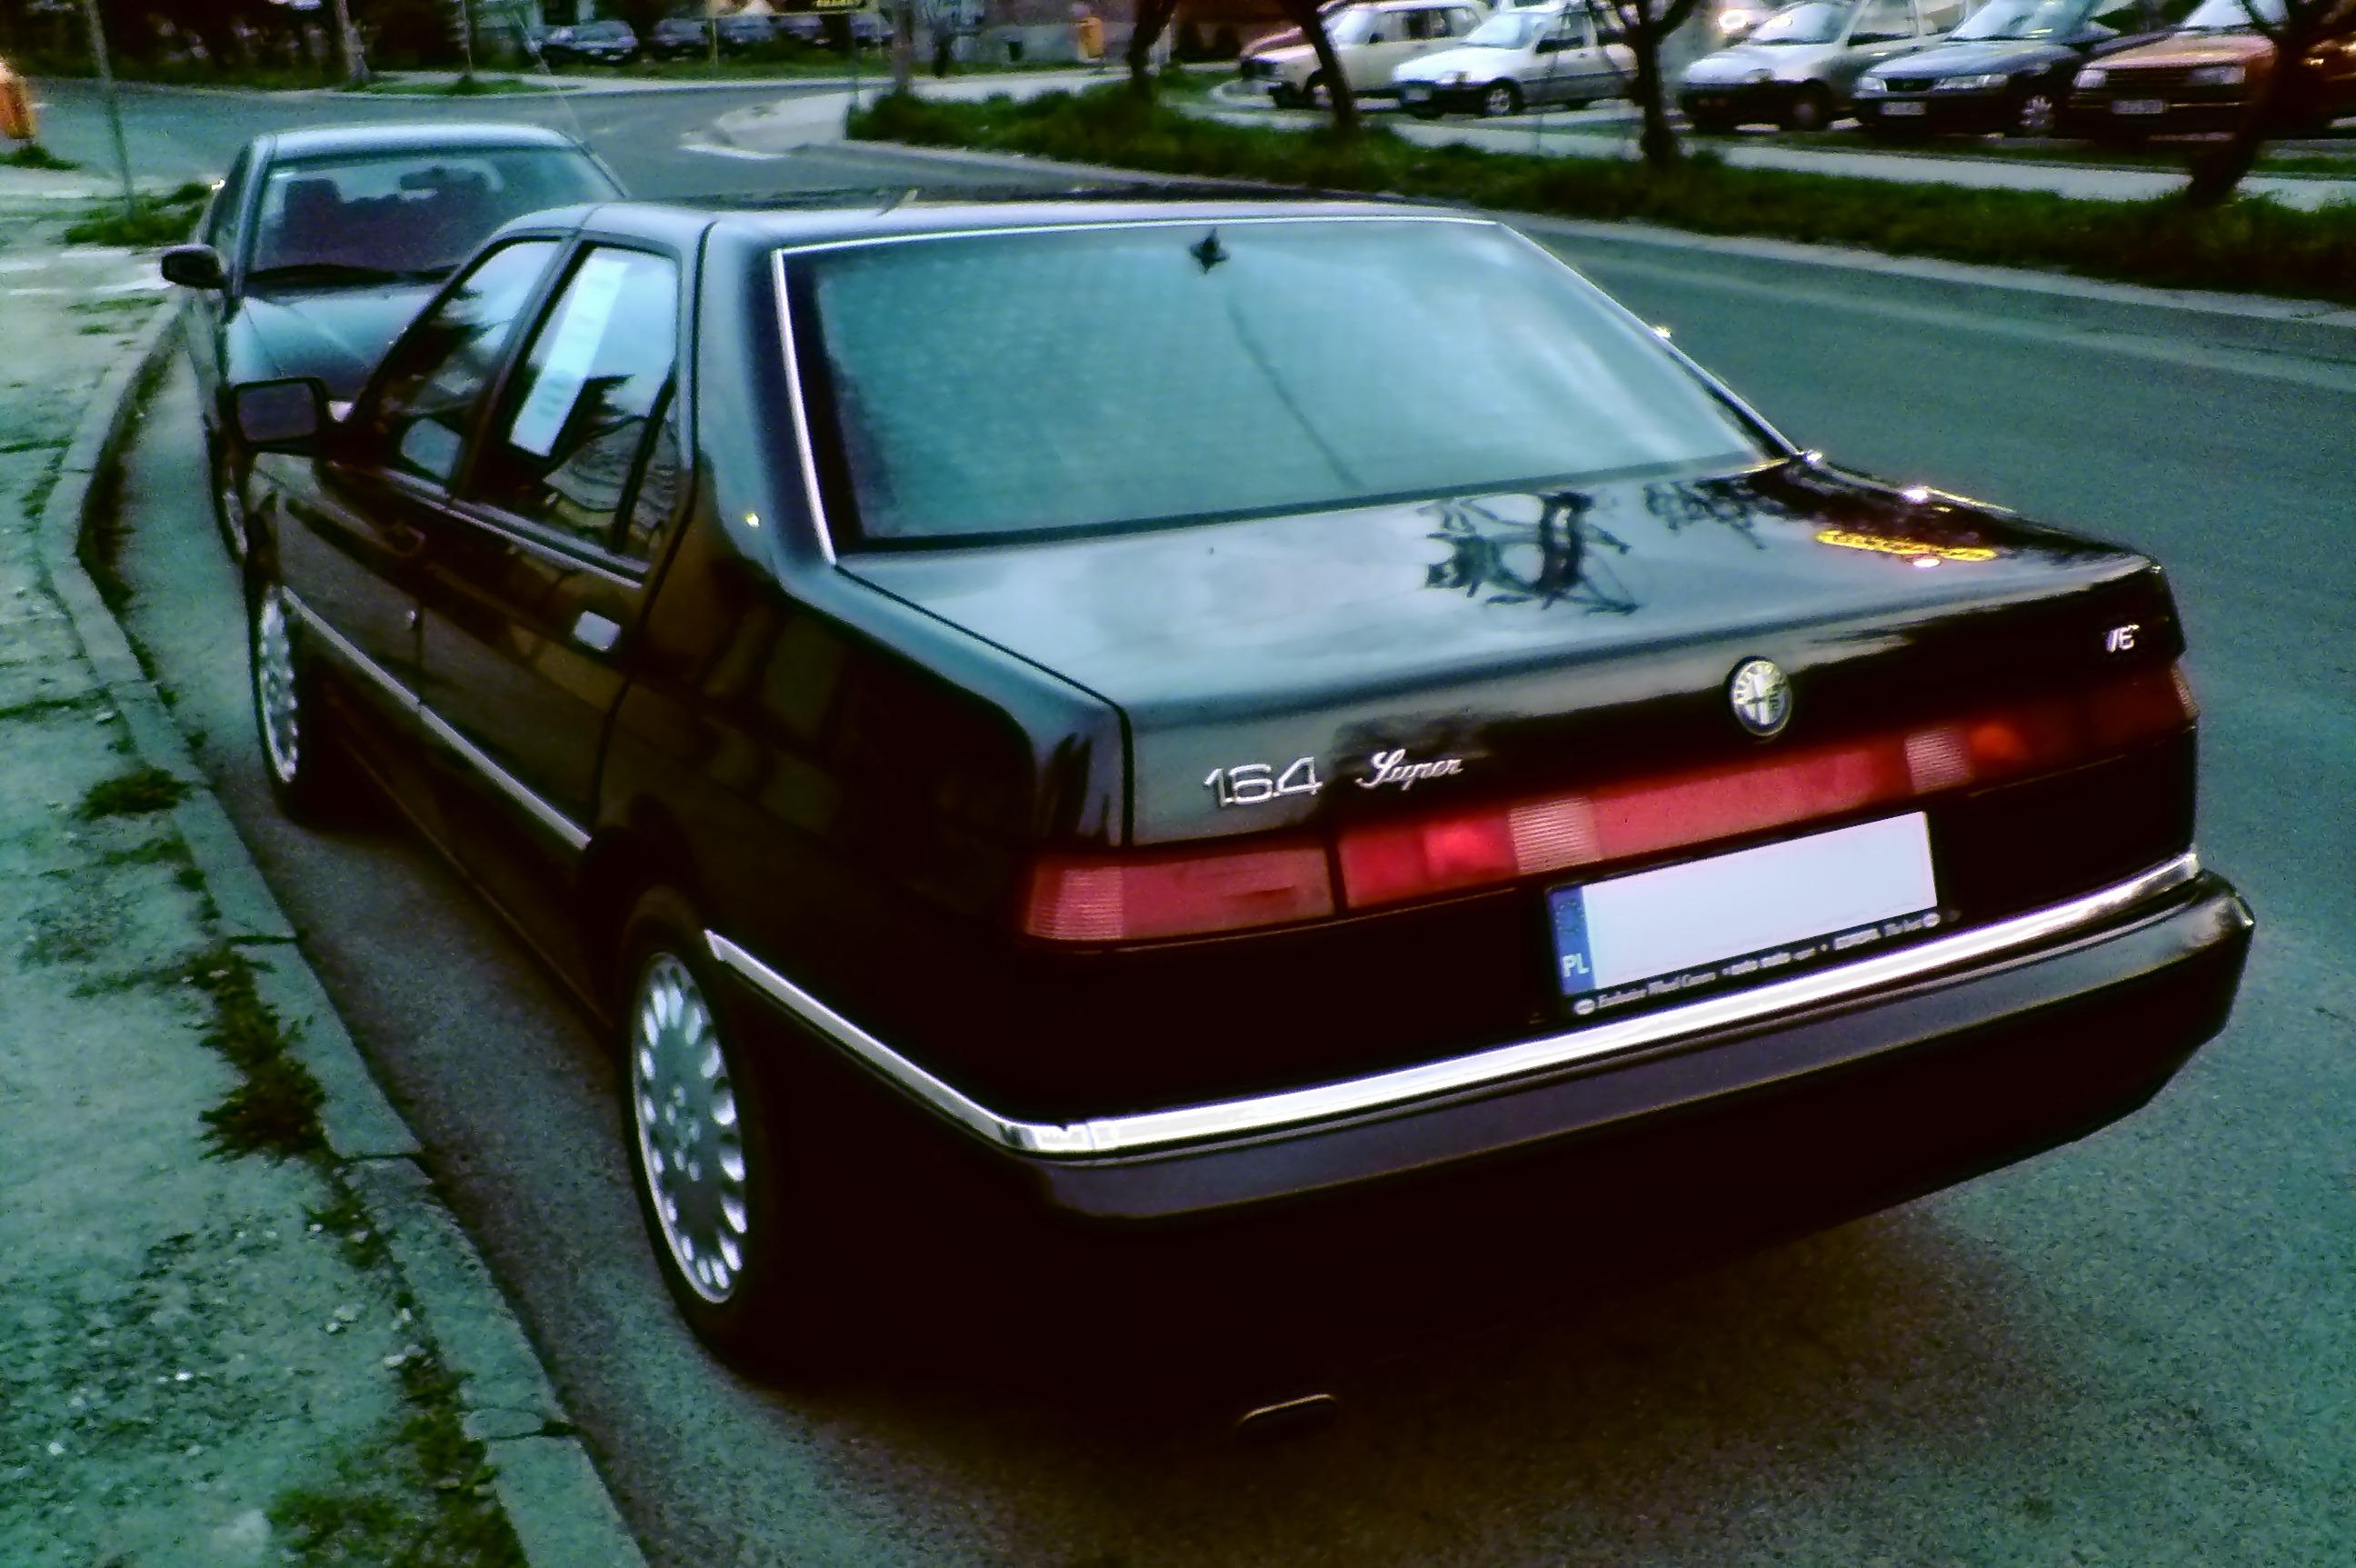 File:Alfa 164 rear jaslo.jpg